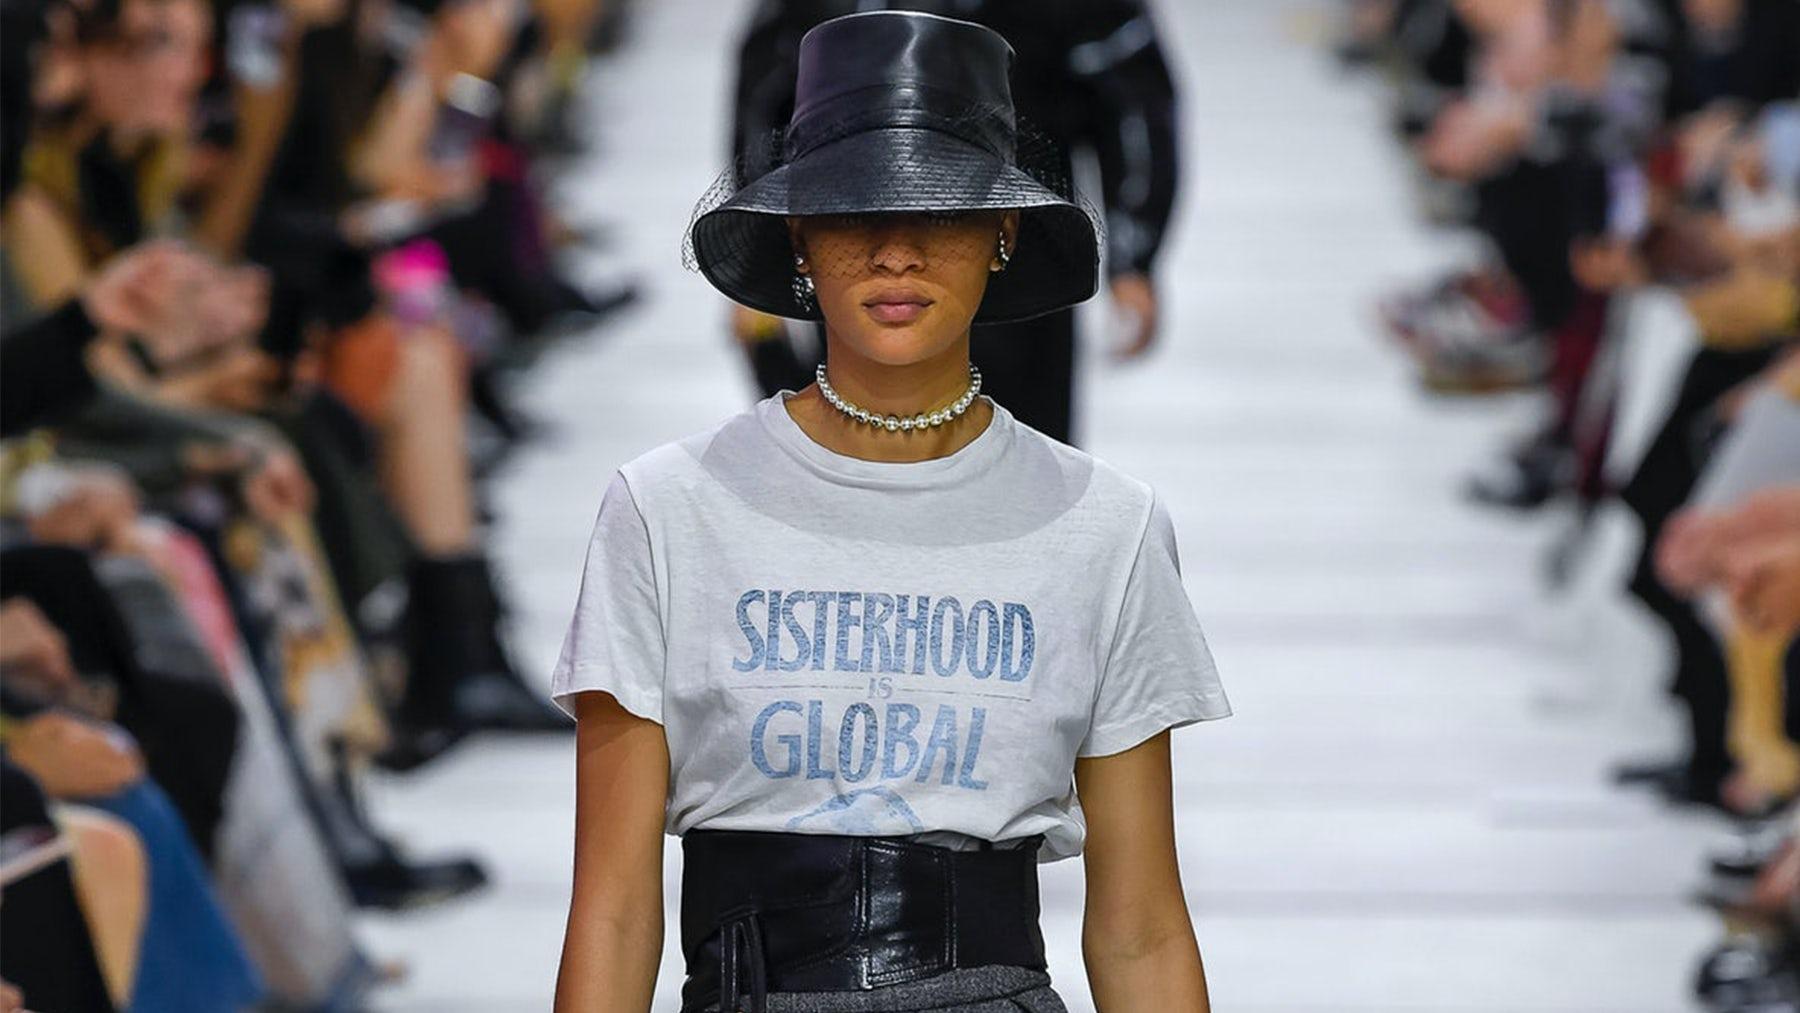 Maria Grazia Chiuri sent models down the runway wearing t-shirts bearing the titles of books by feminist author Robin Morgan | Source: Indigital